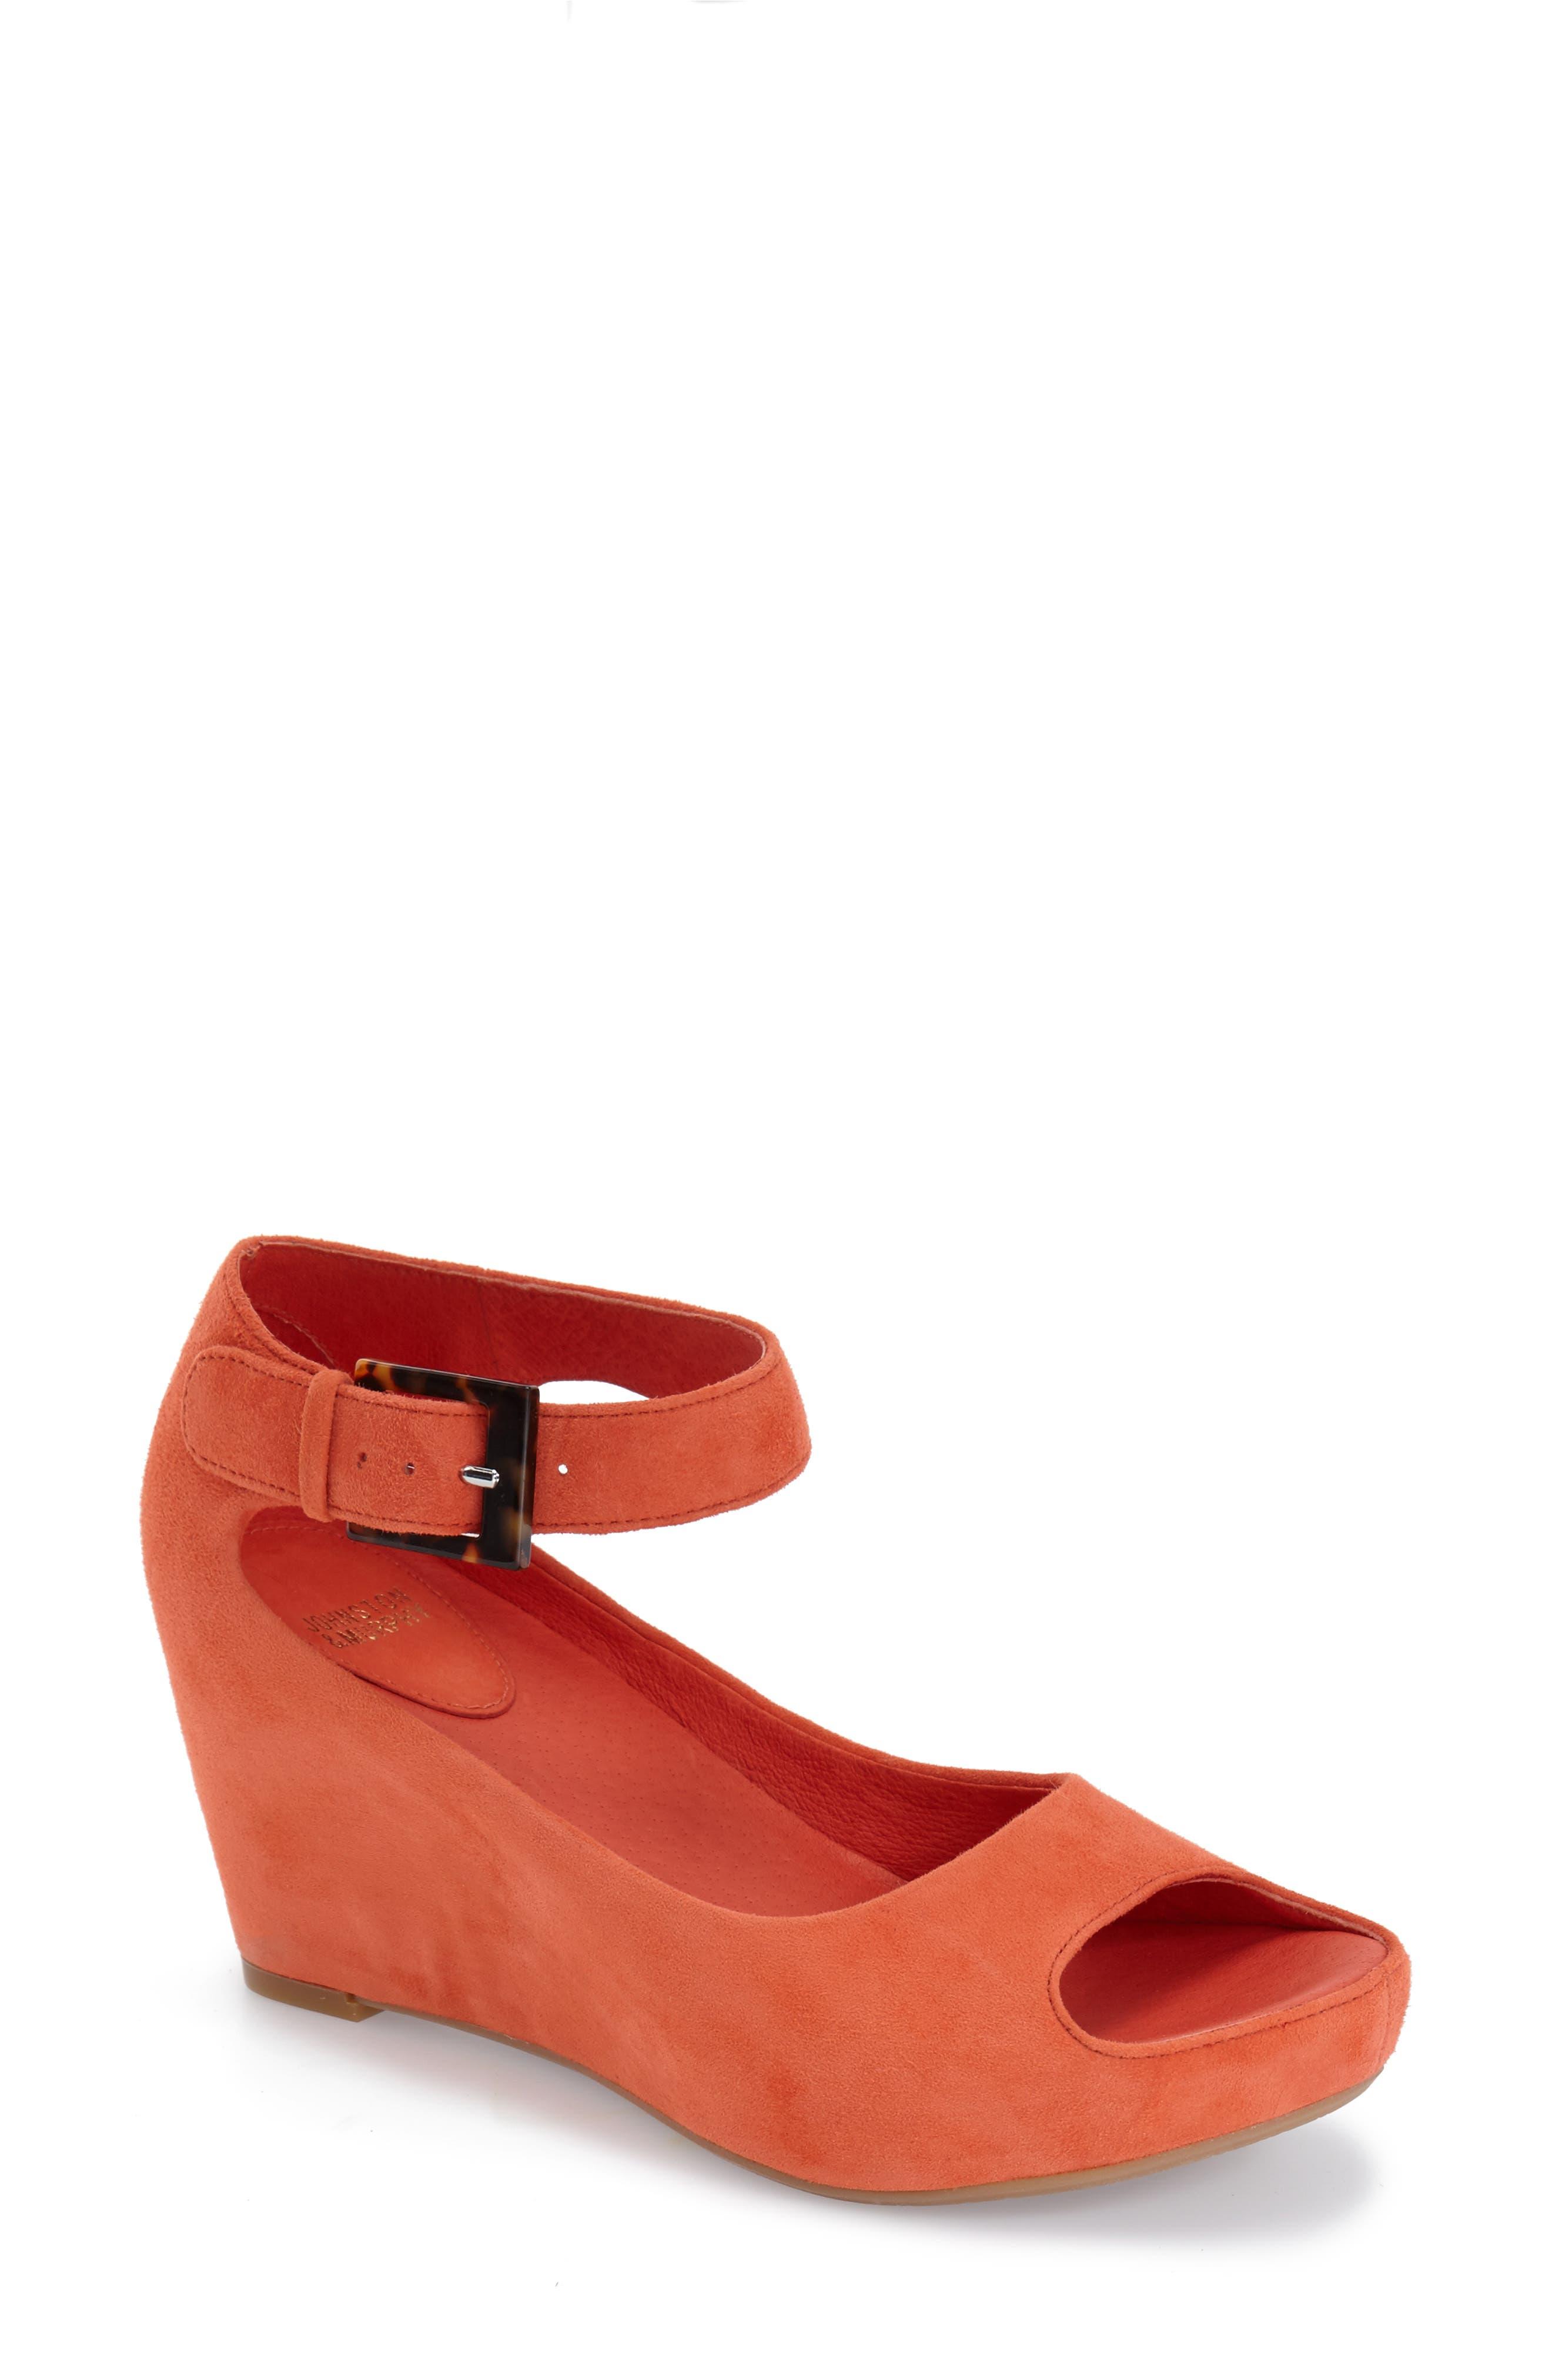 'Tricia' Ankle Strap Sandal,                             Alternate thumbnail 33, color,